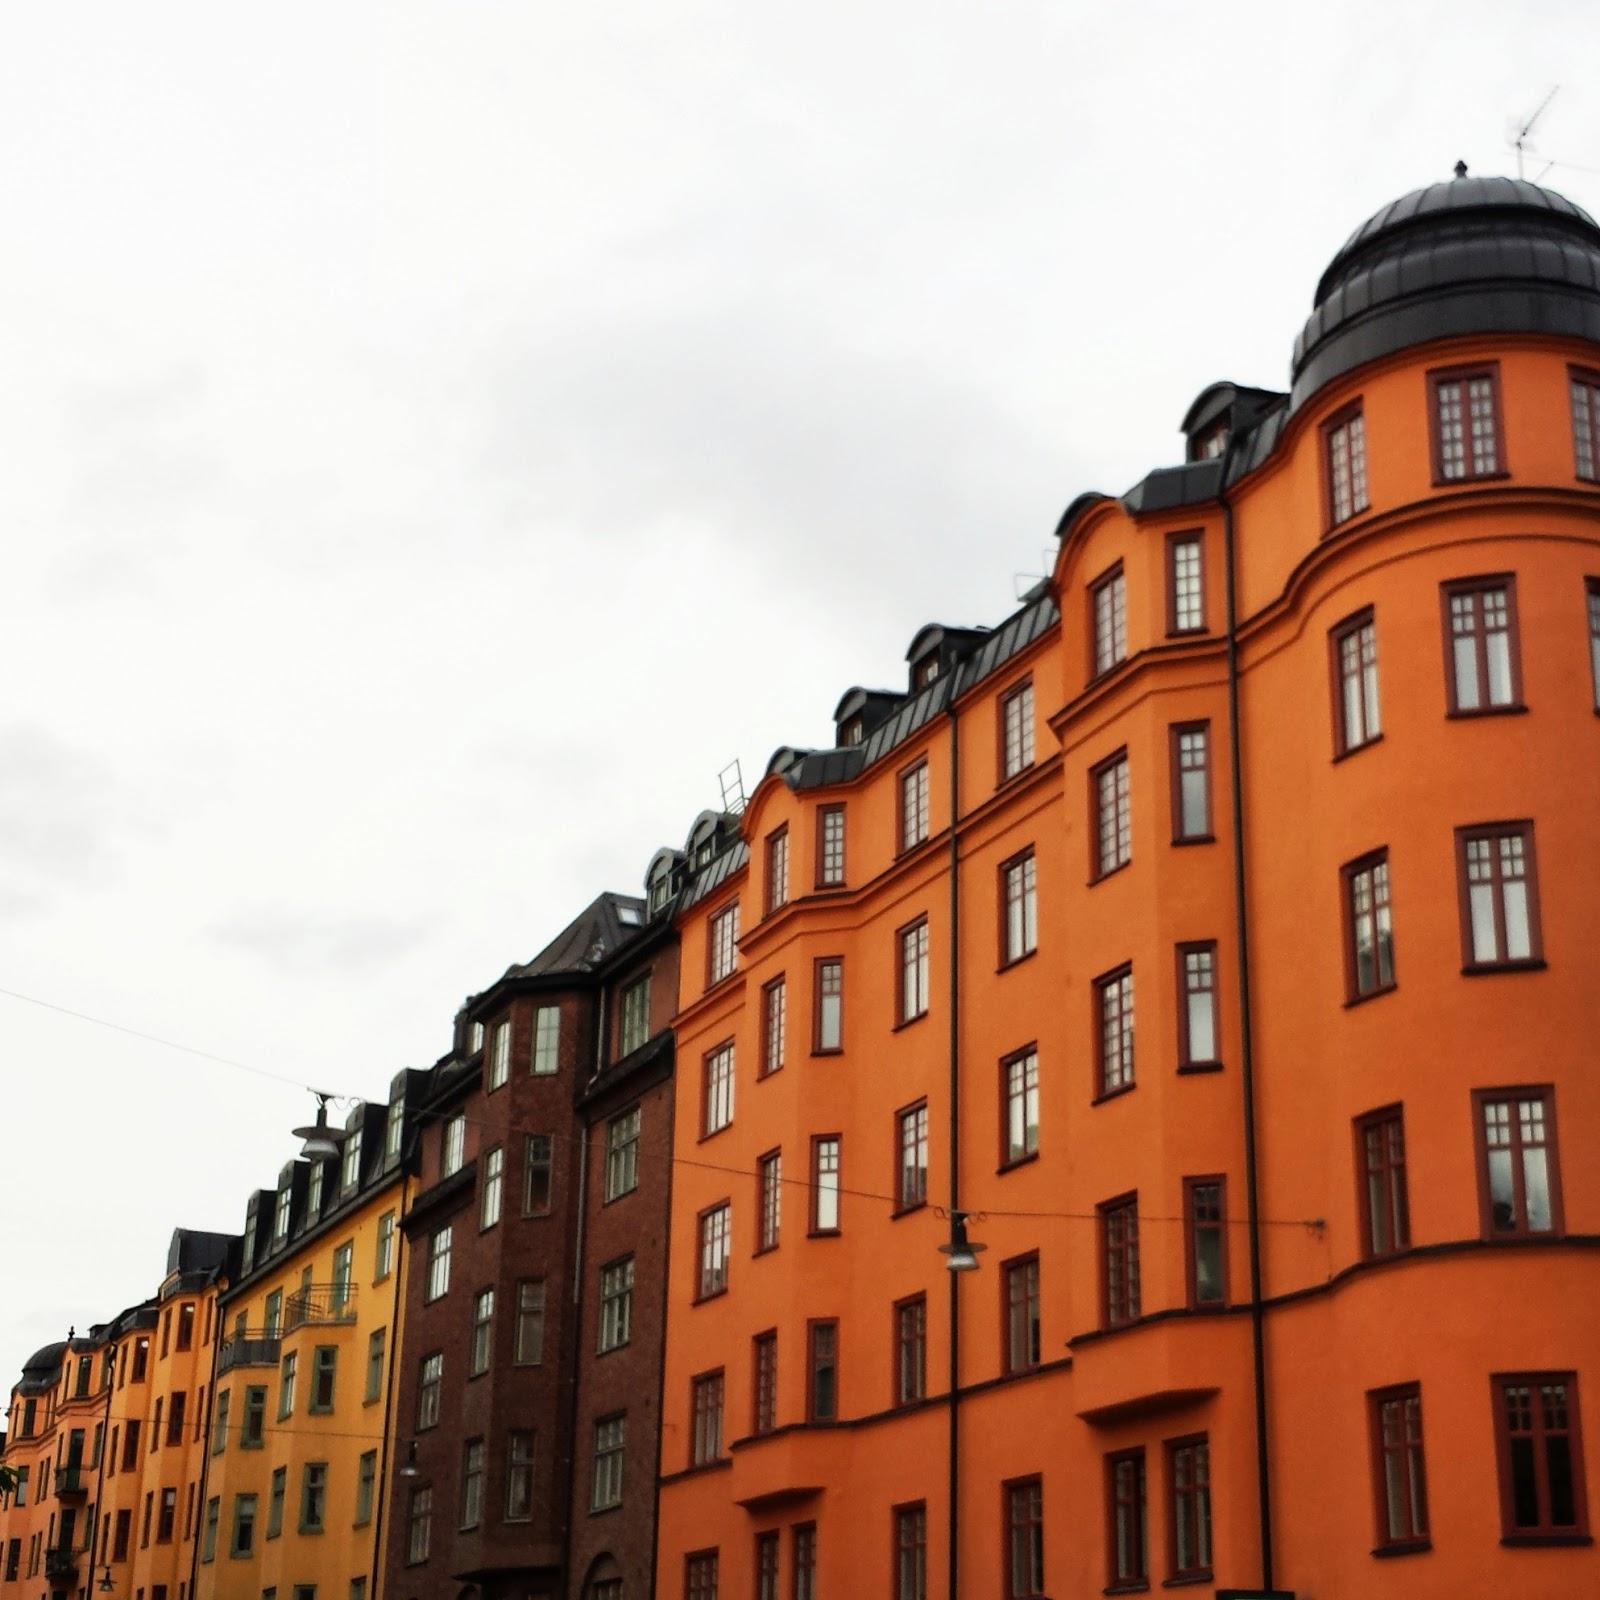 Vasastan  |  Learning to speak Swedish on afeathery*nest  |  http://afeatherynest.com